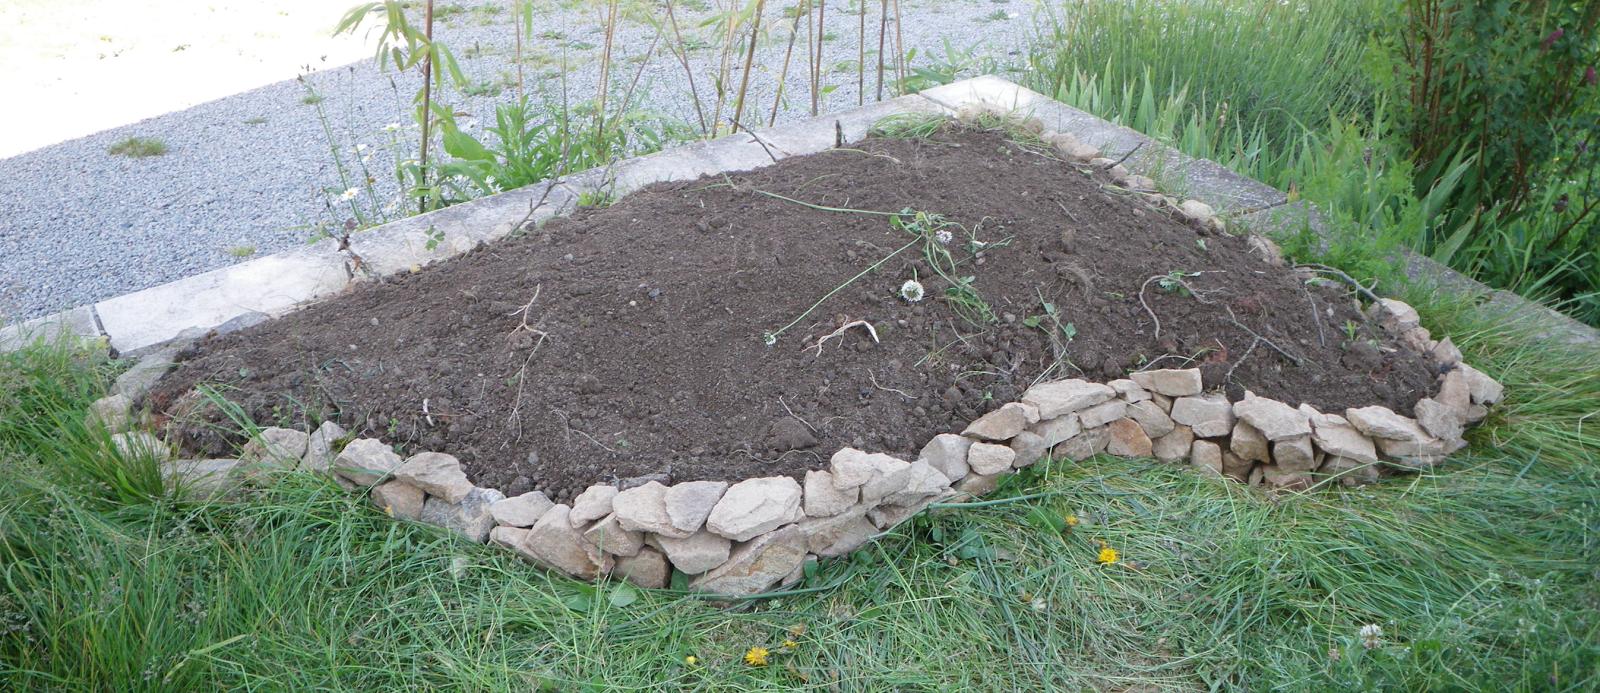 Le jardin d 39 alieska for Amenagement jardin avec butte